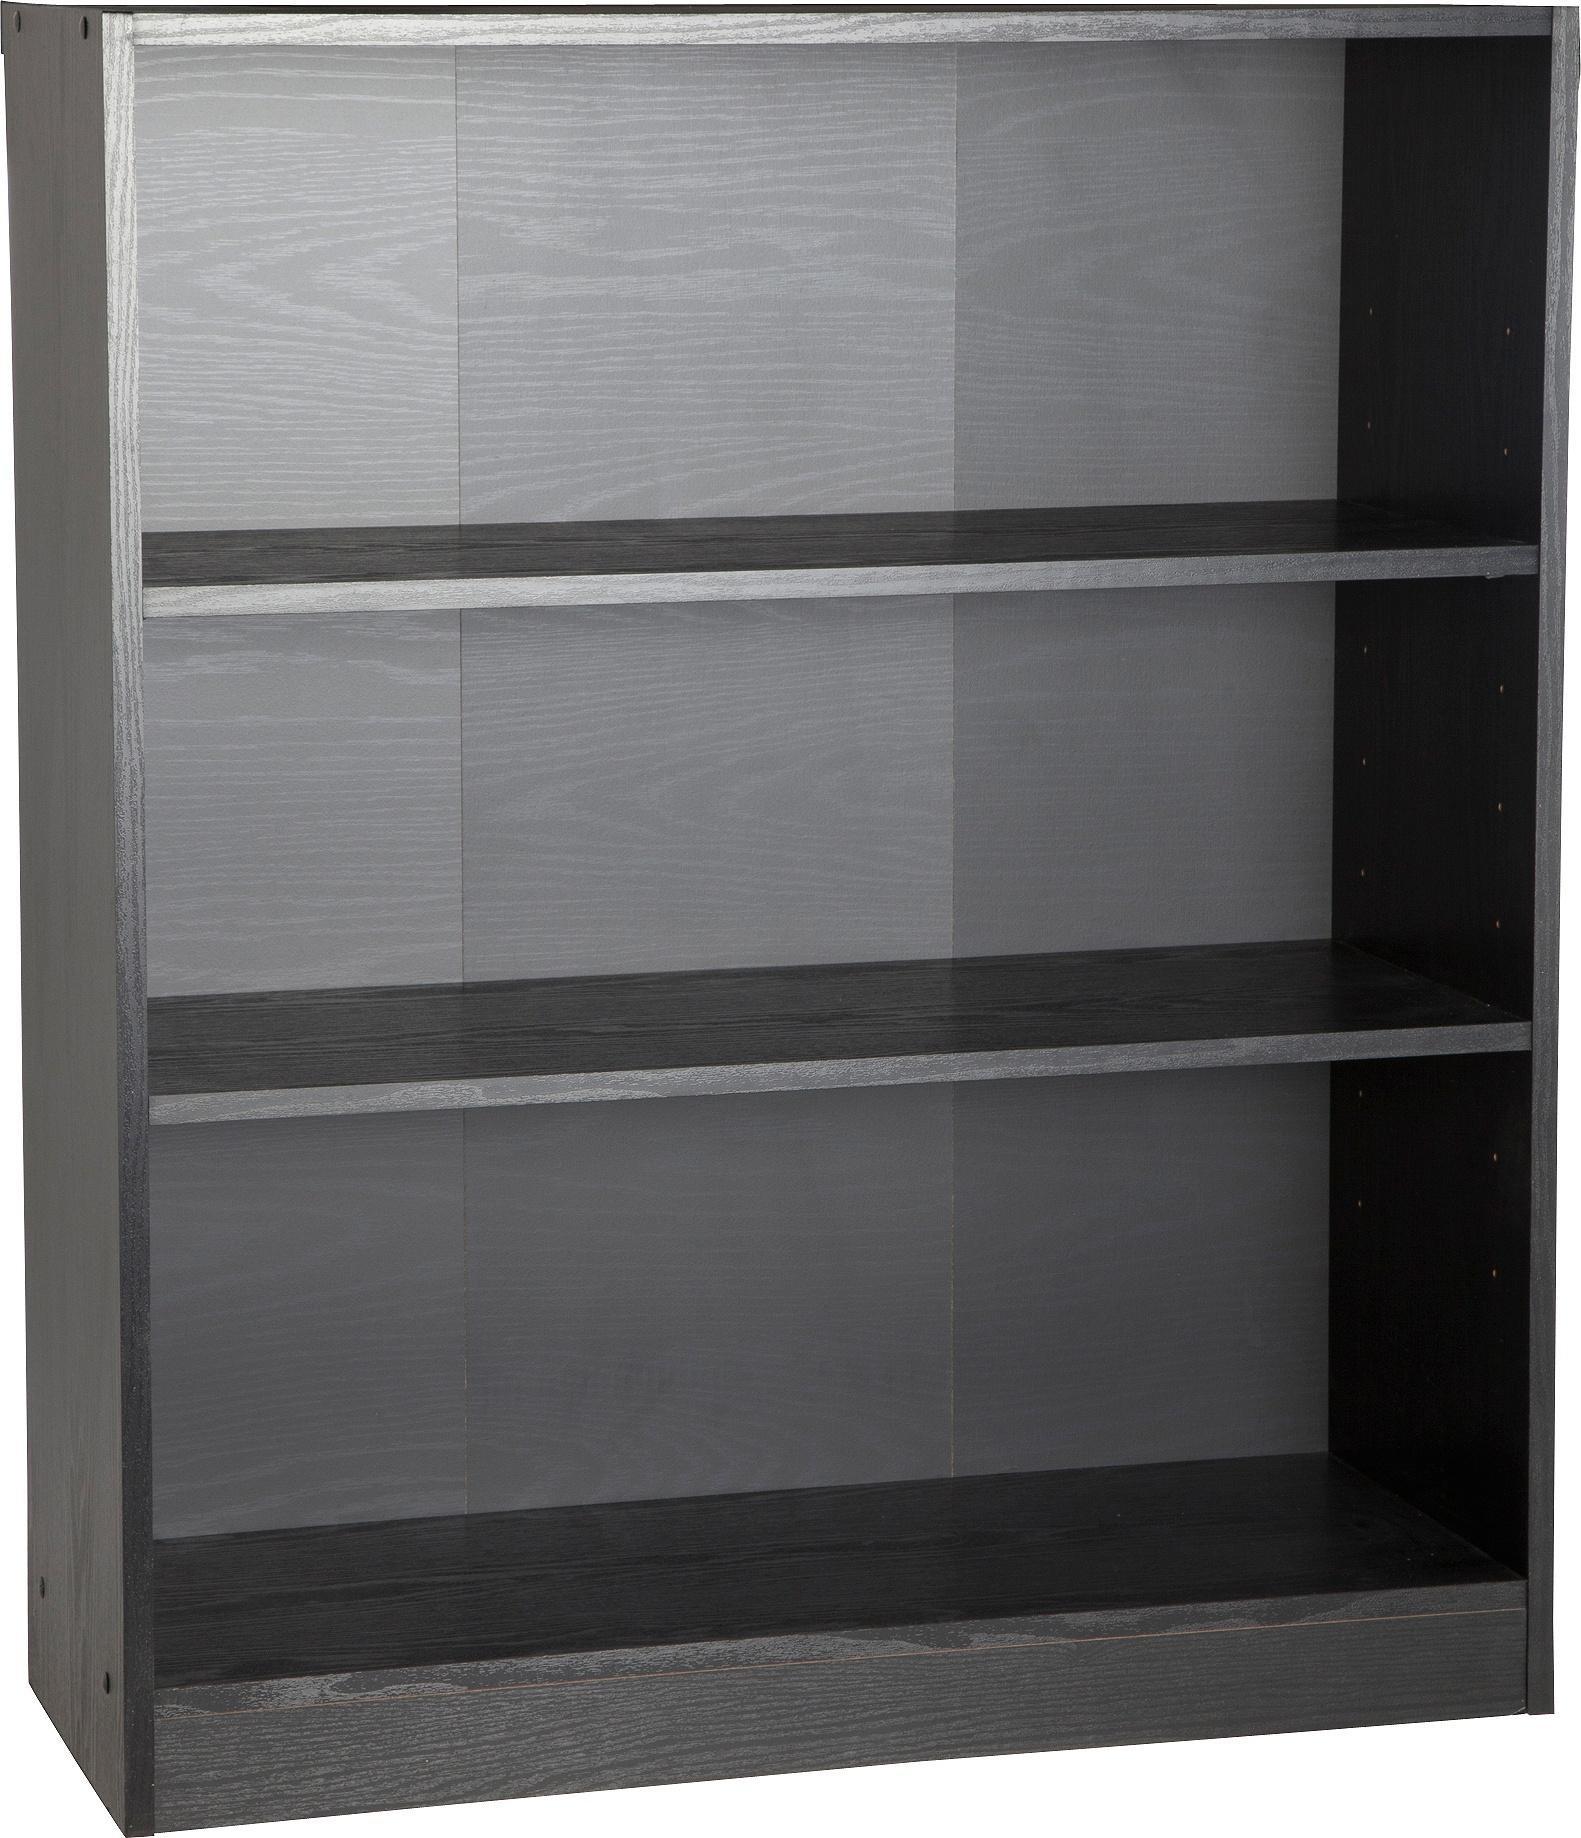 Habitat Maine 2 Shelf Small Bookcase - Black Ash Effect